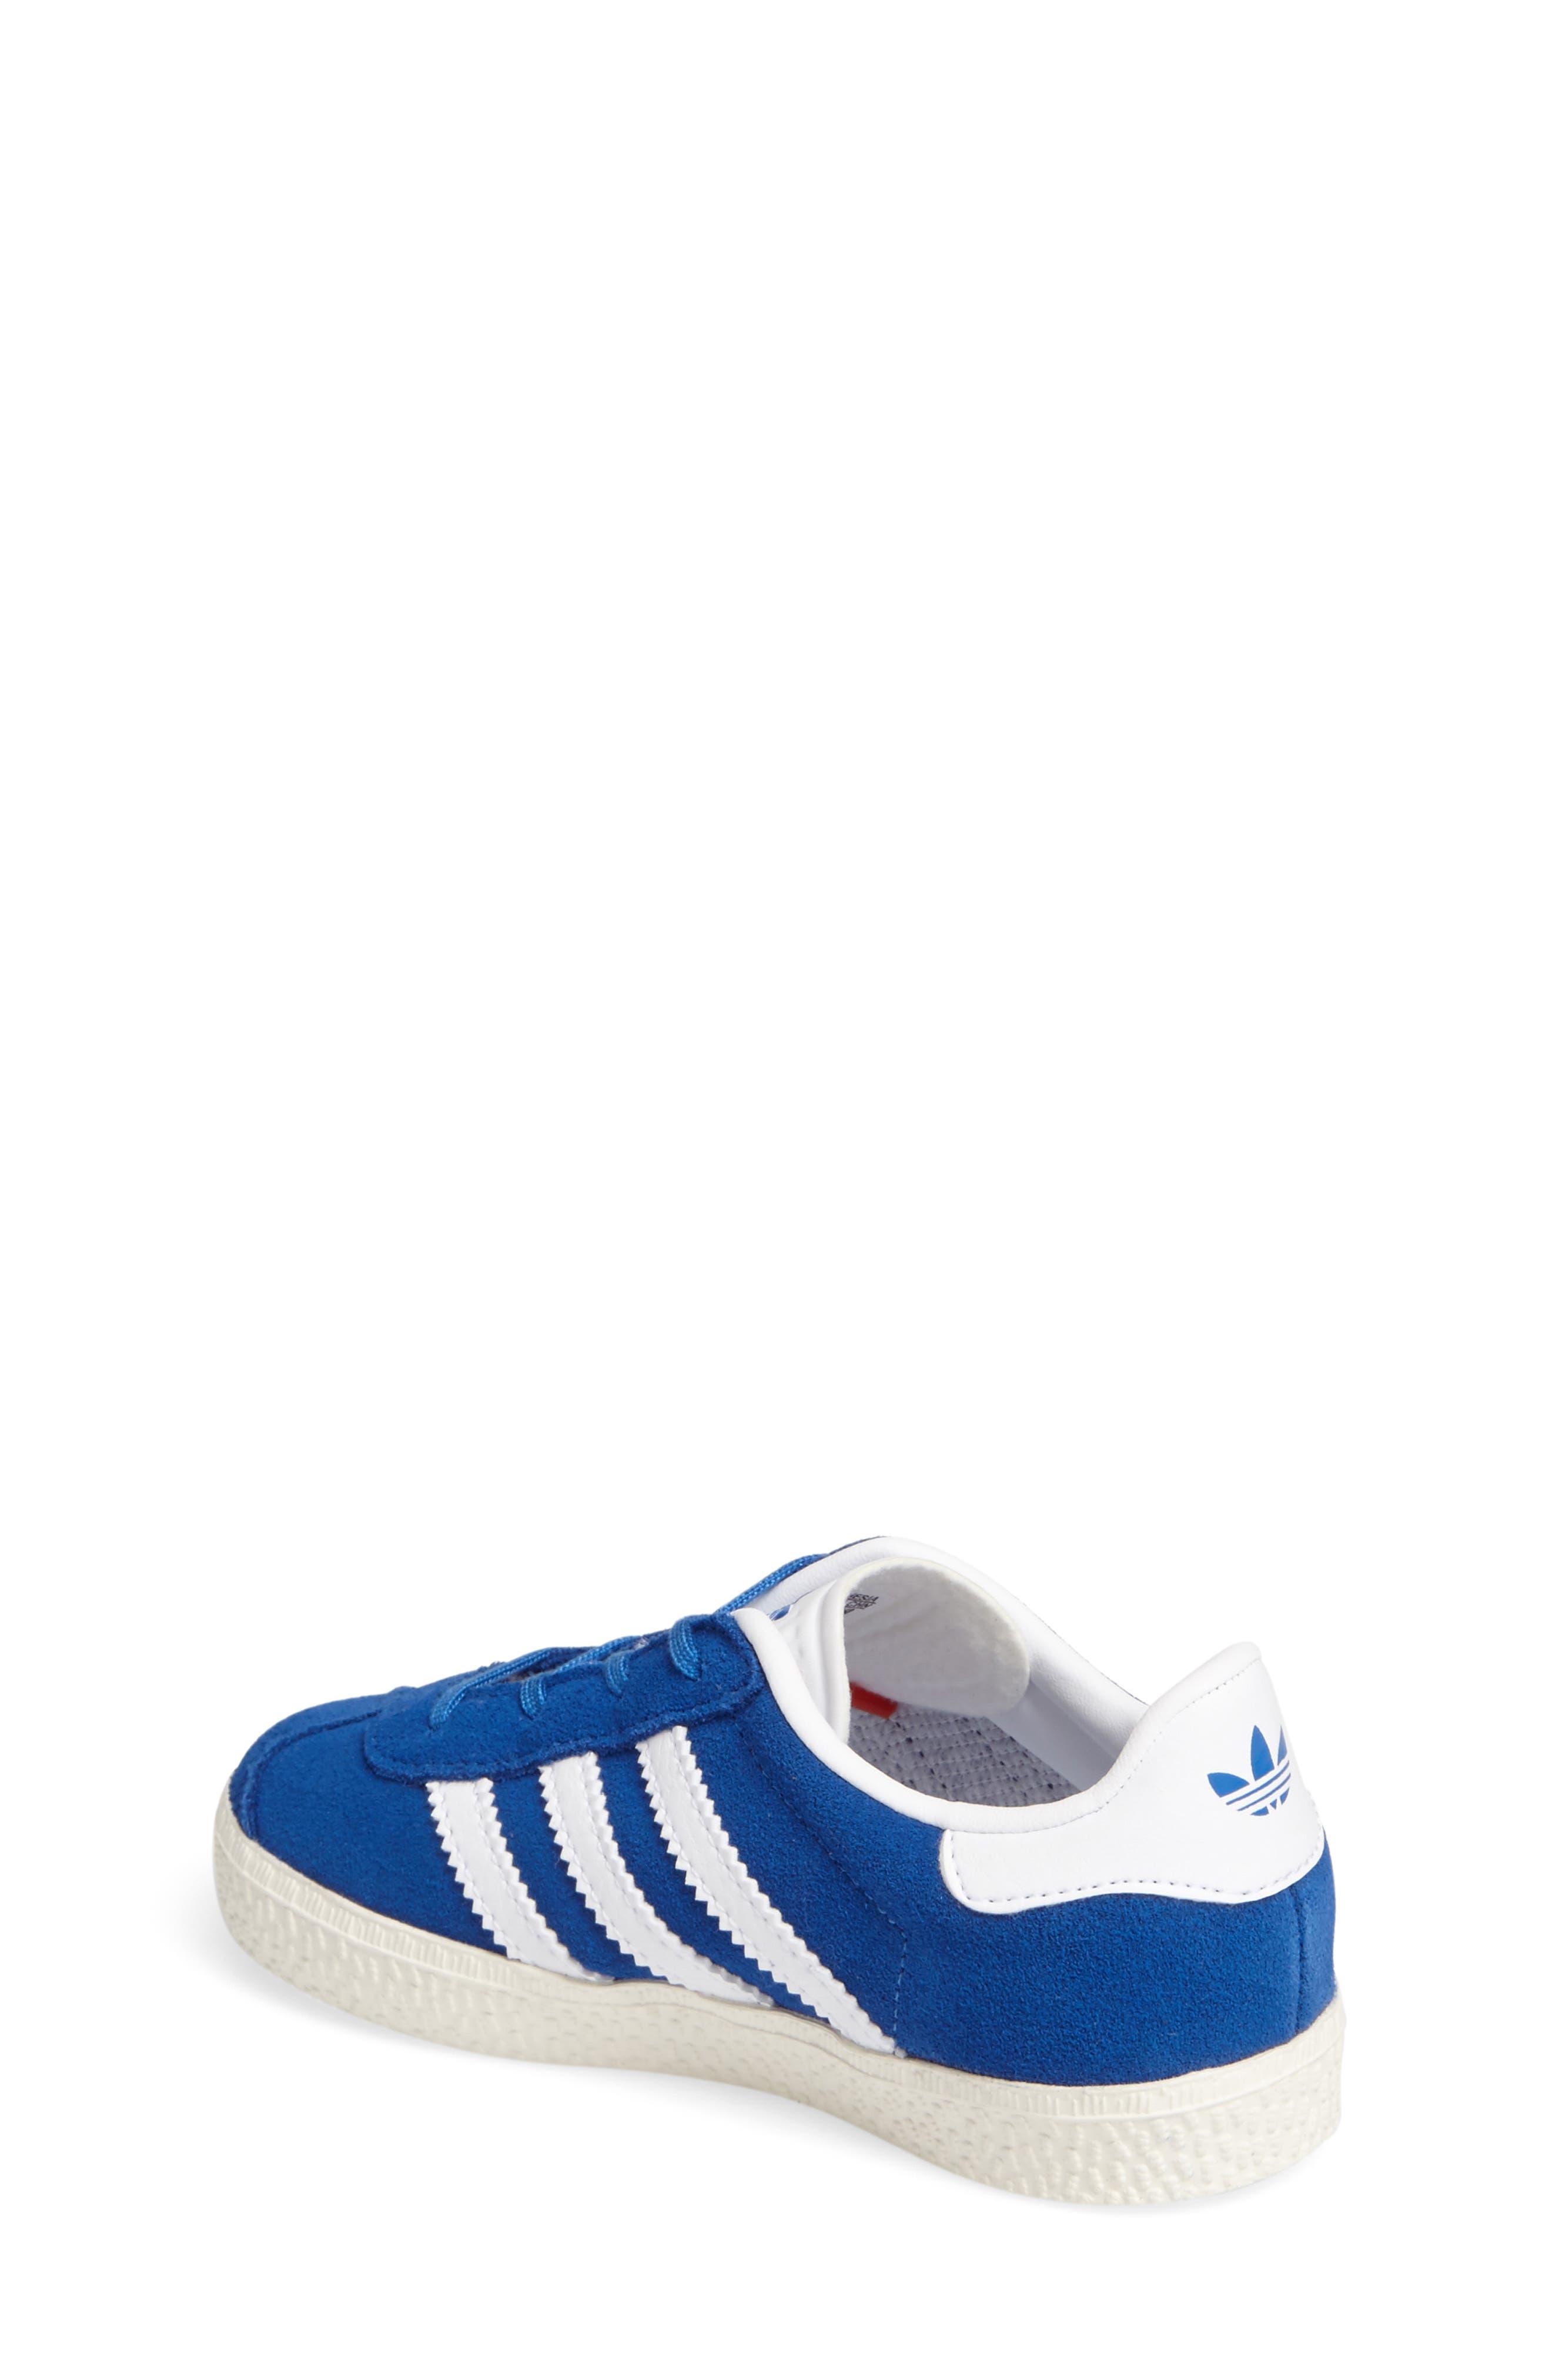 Gazelle Sneaker,                             Alternate thumbnail 2, color,                             Blue/ White/ Gold Metallic